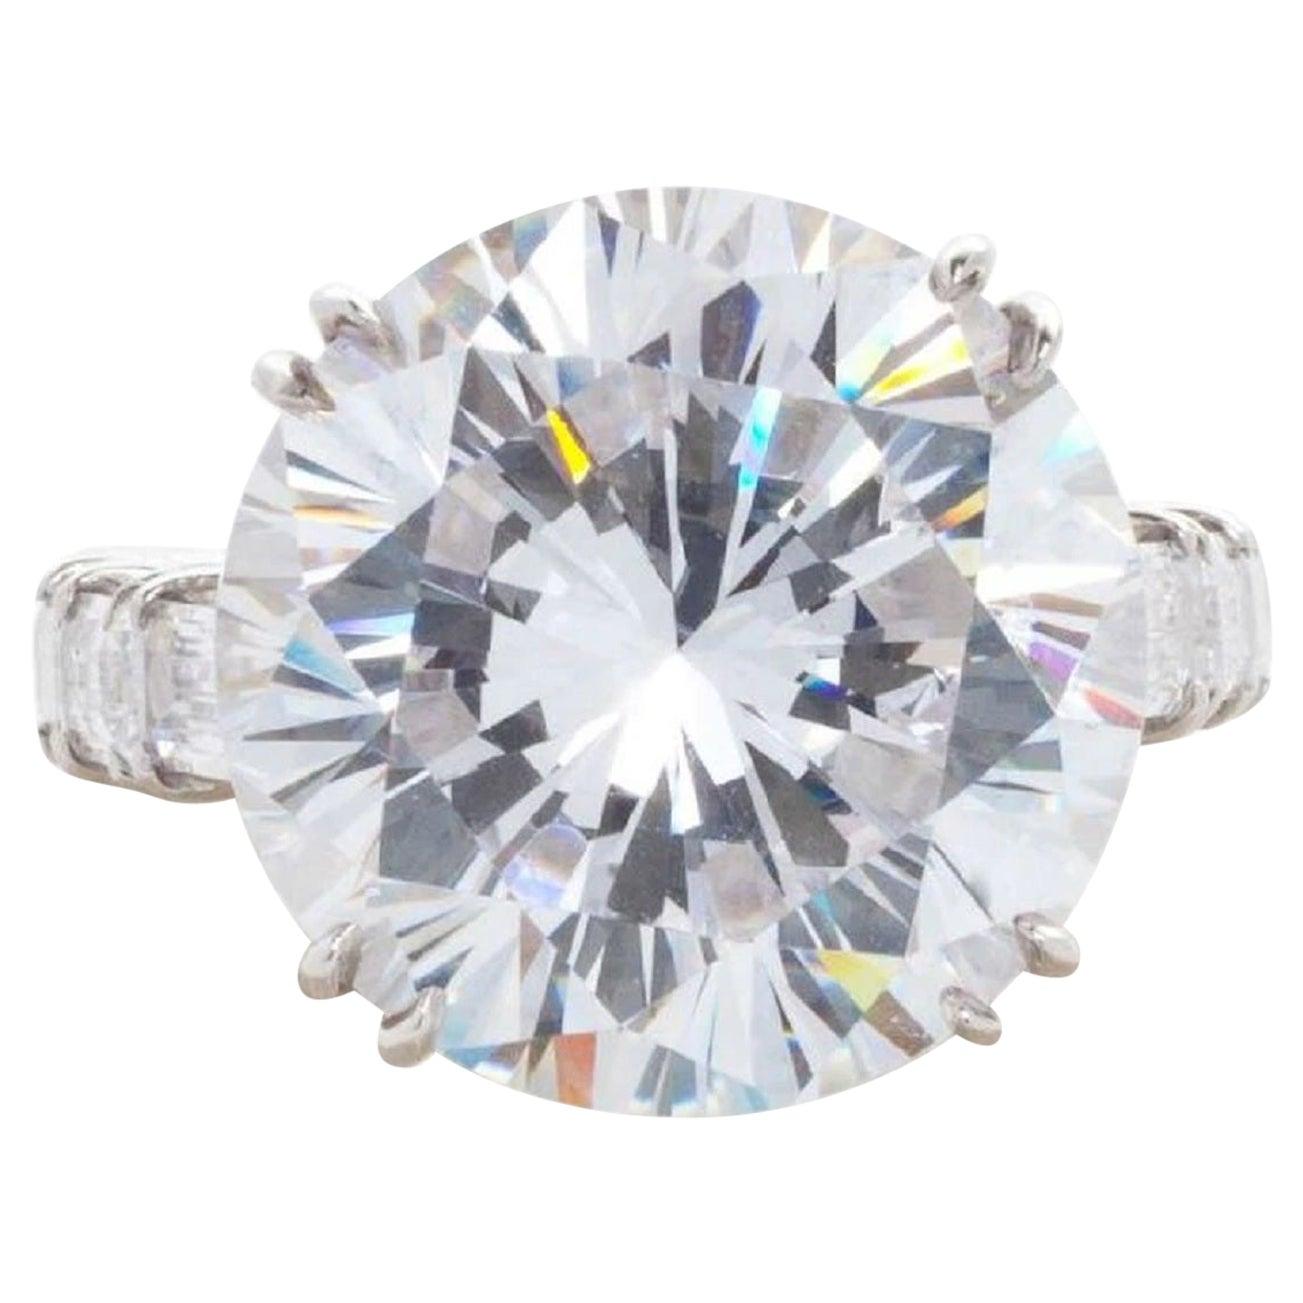 GIA Certified 10.02 Carat Round Brilliant Cut Diamond Ring